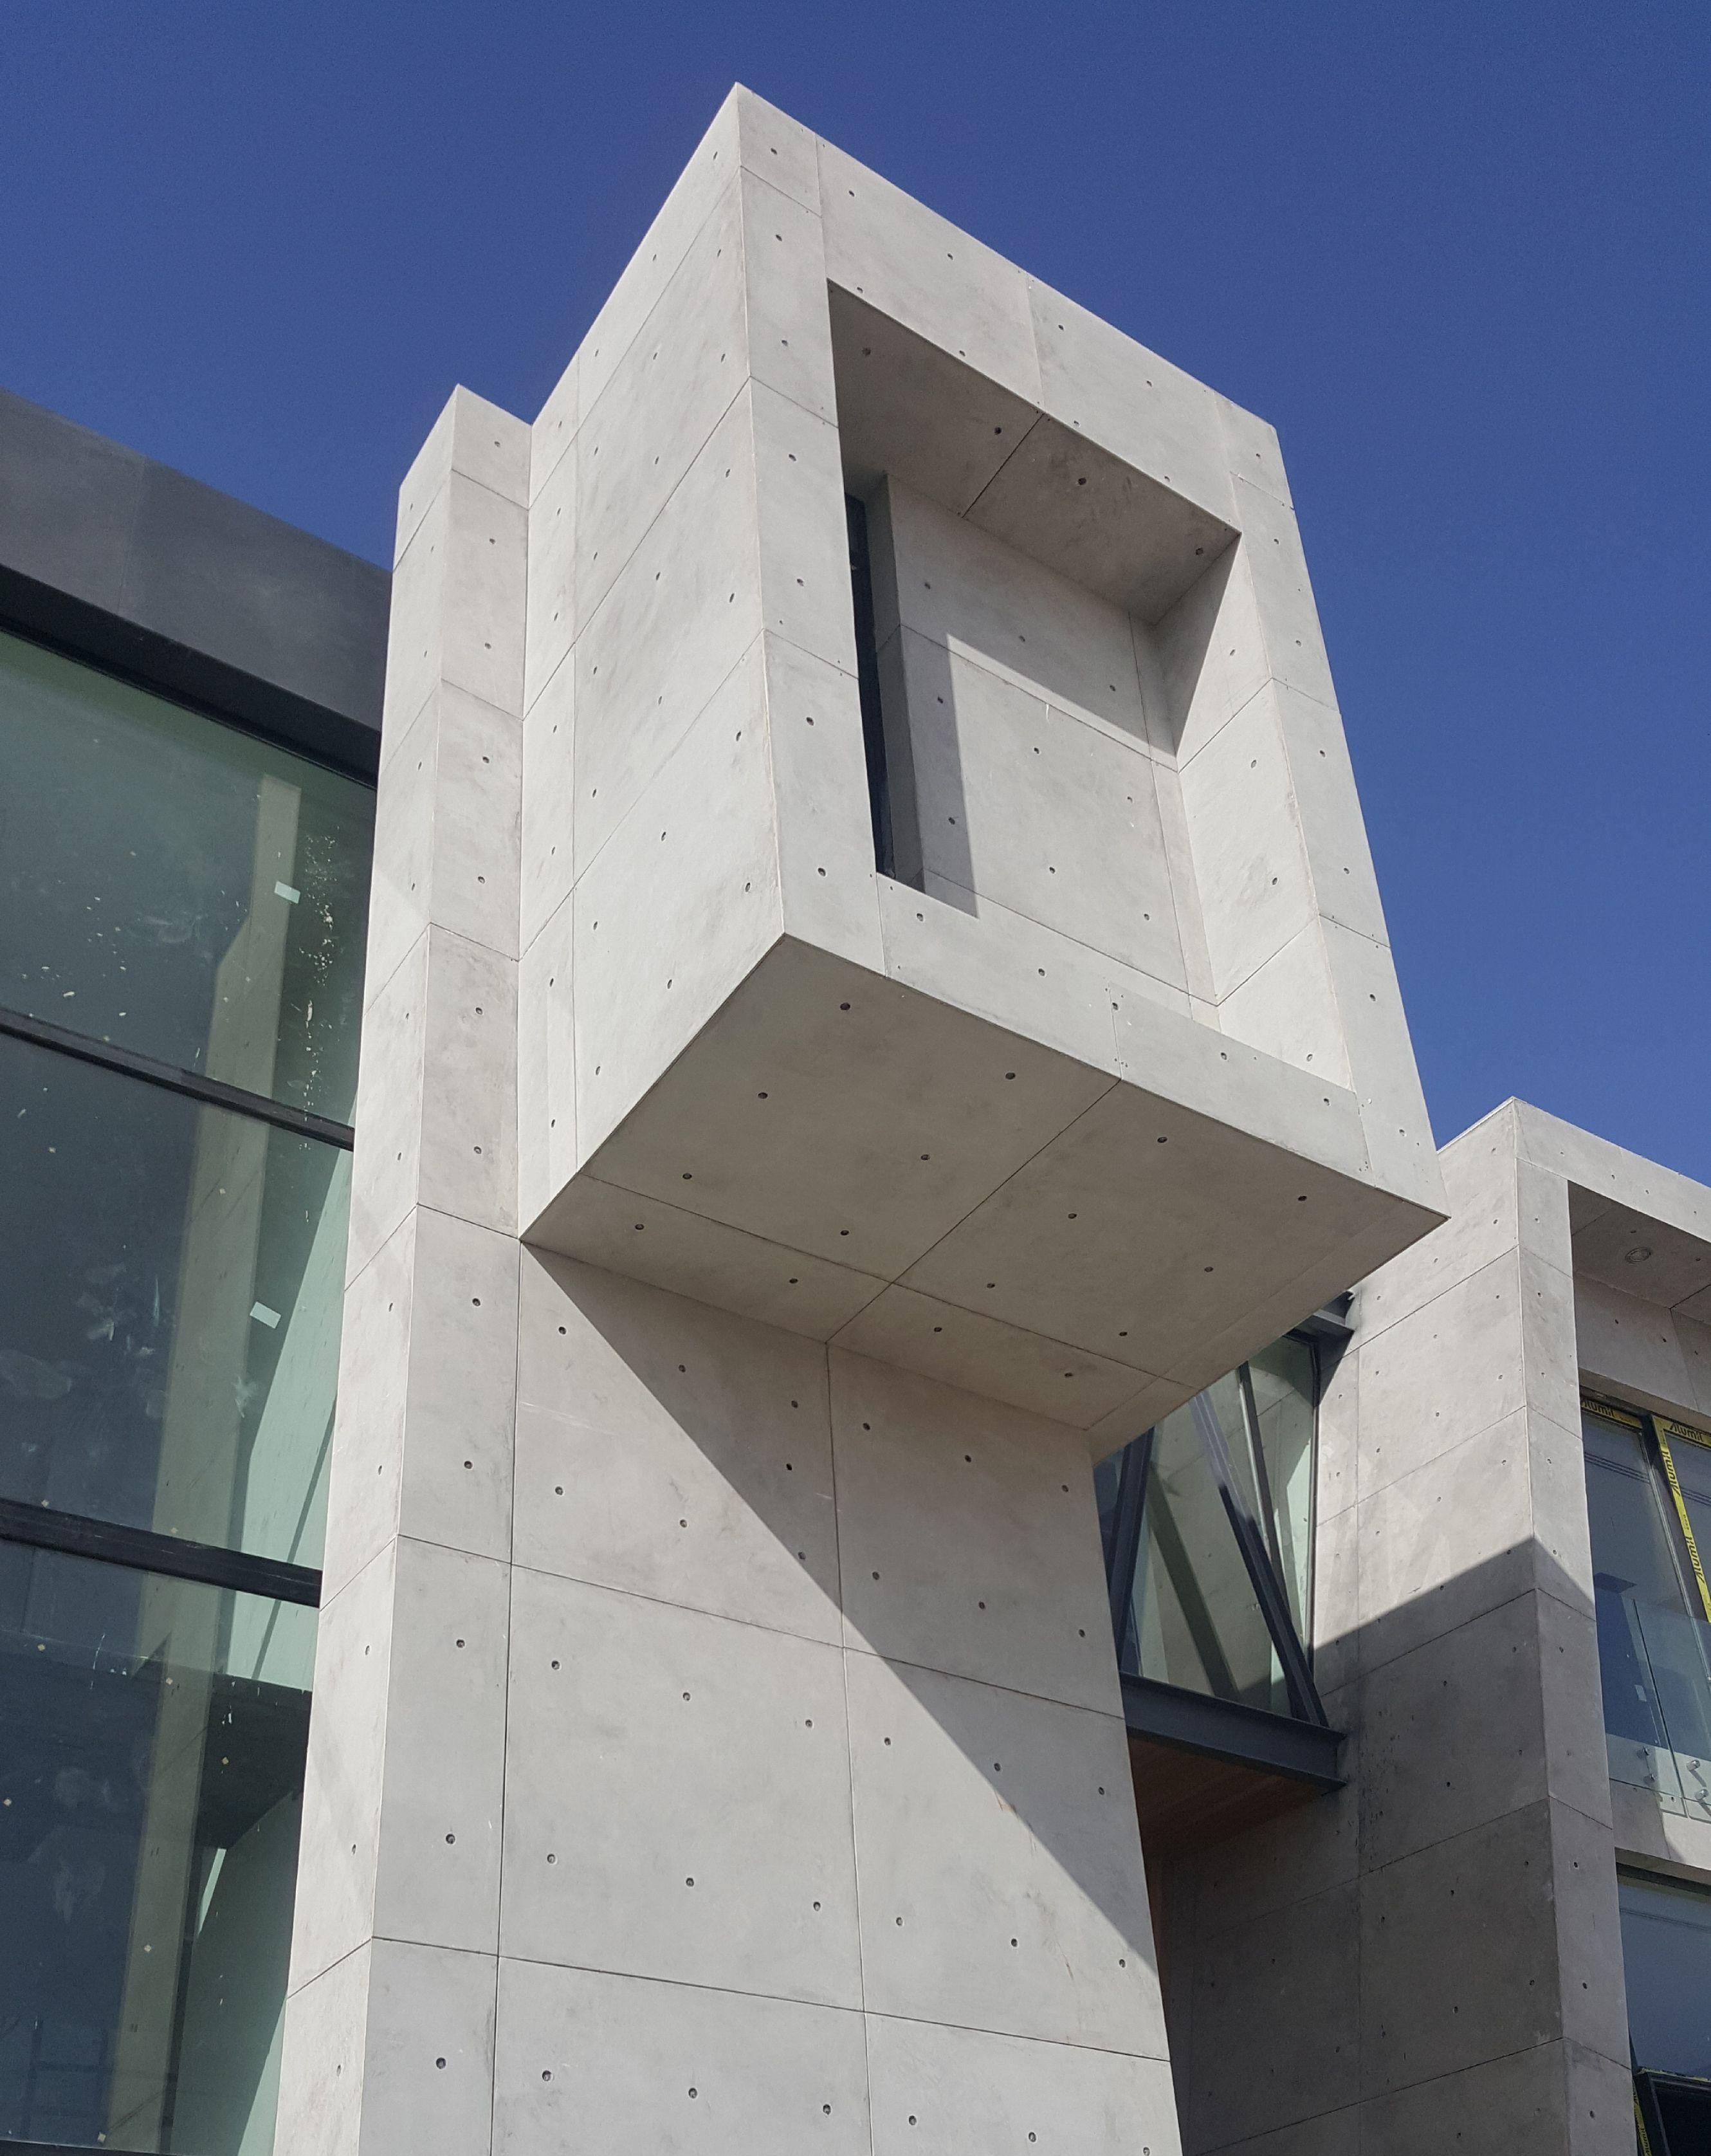 Concrete Exterior Facade Cladding With Cretox Panel The Glue Up Concrete Tile Panel For Creati Concrete Wall Panels Precast Concrete Concrete Panels Interior